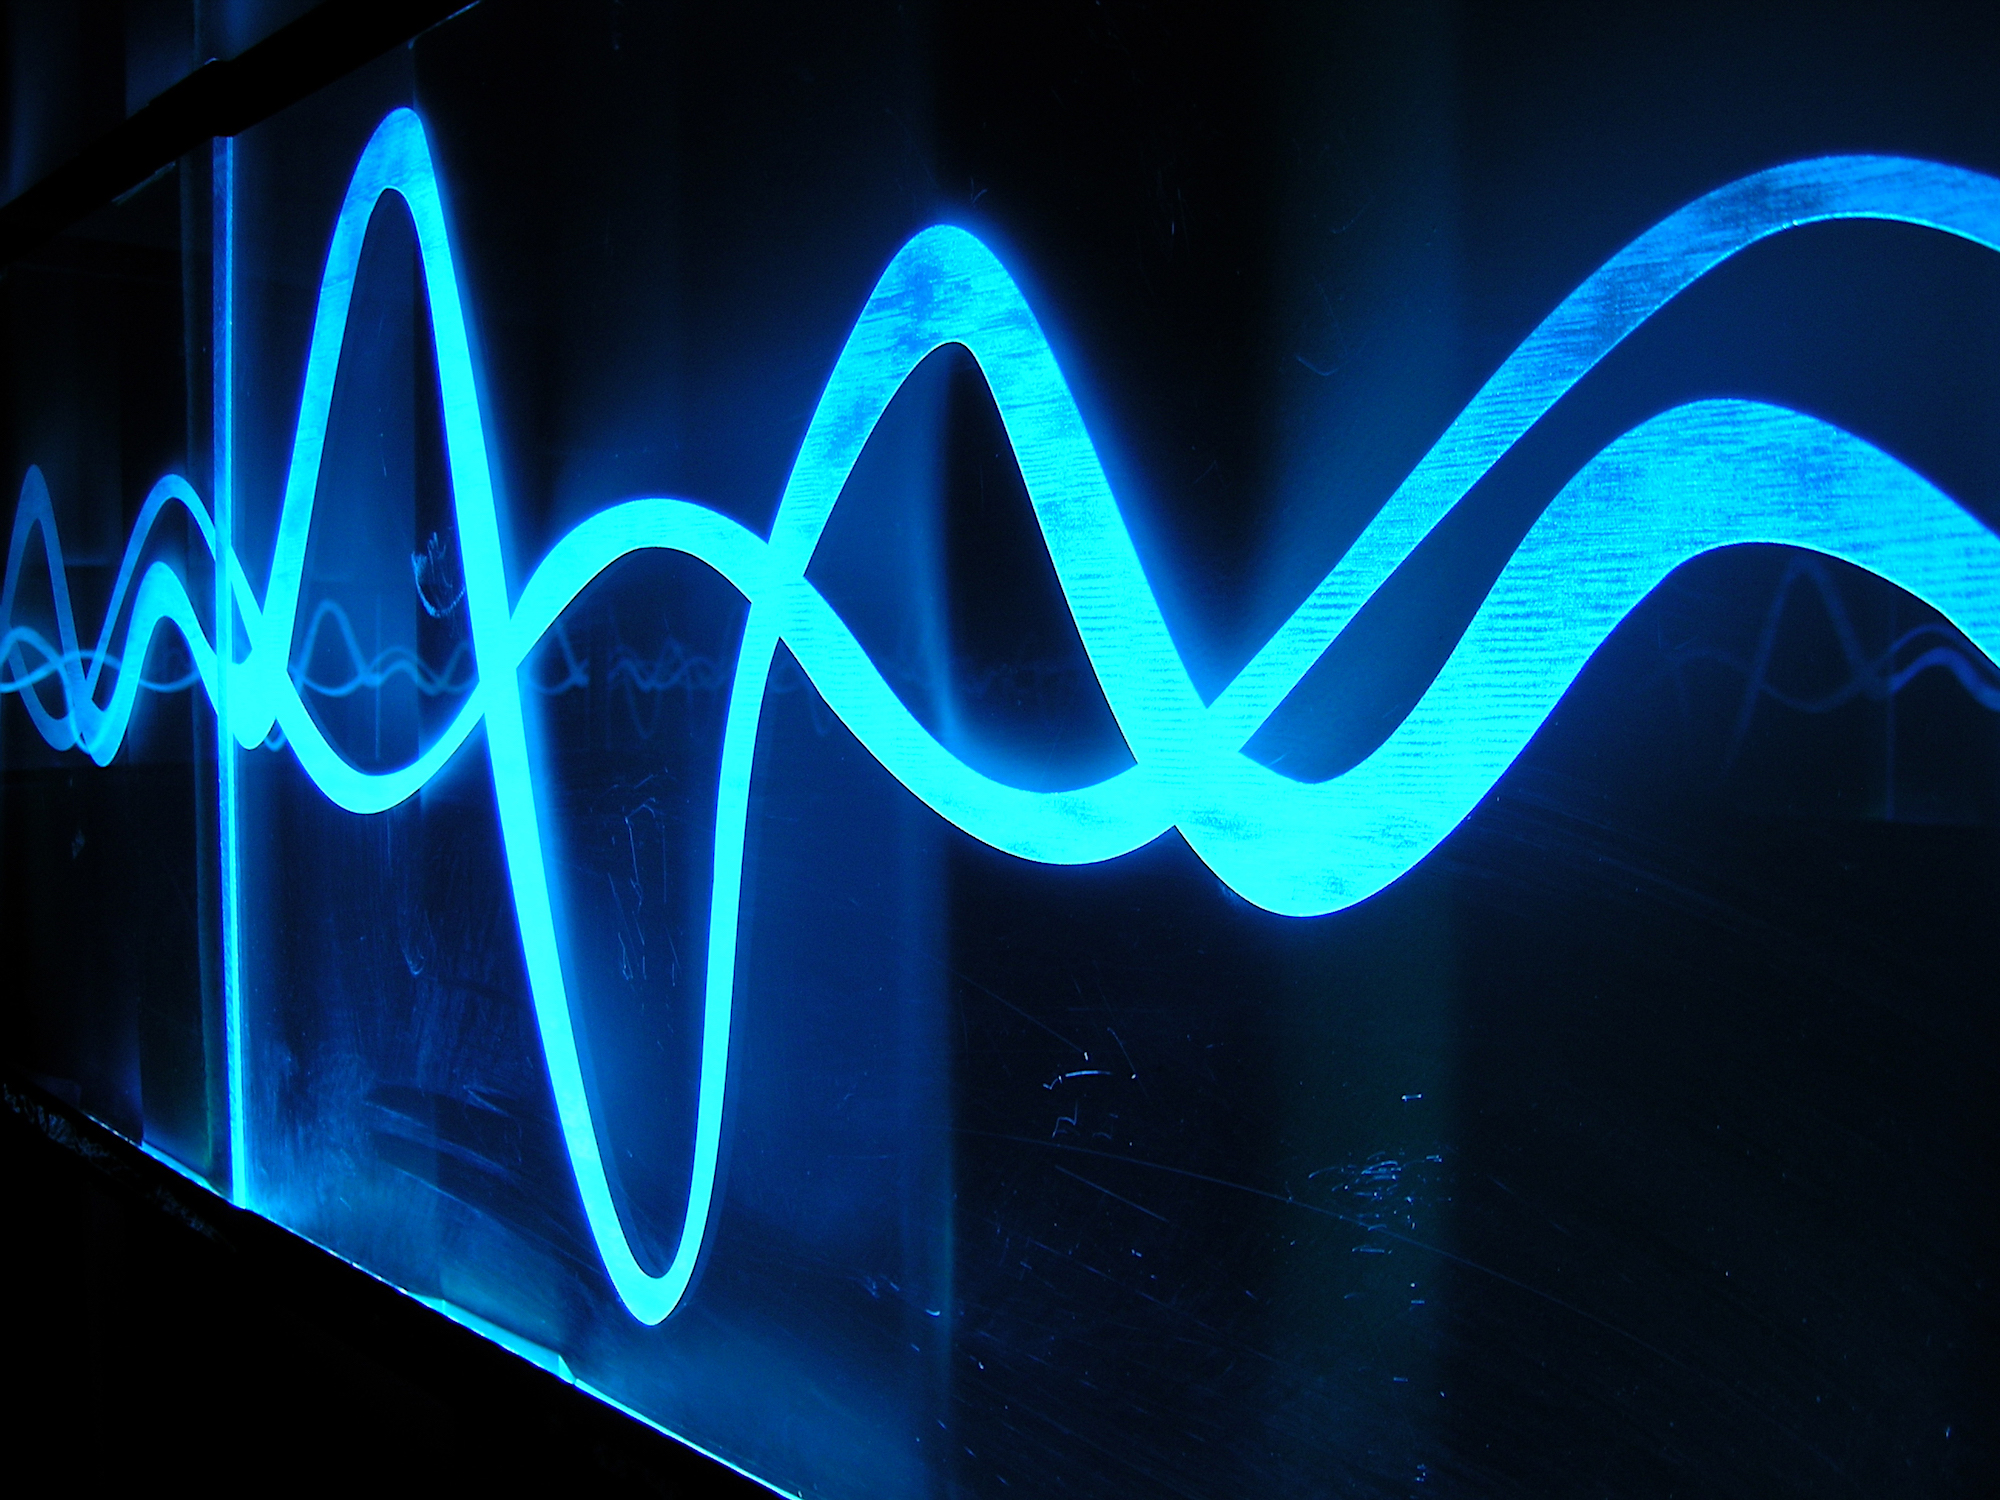 eleanor-bell-light-artist-eden-project-wave-hub-cornwall-design-season.jpg